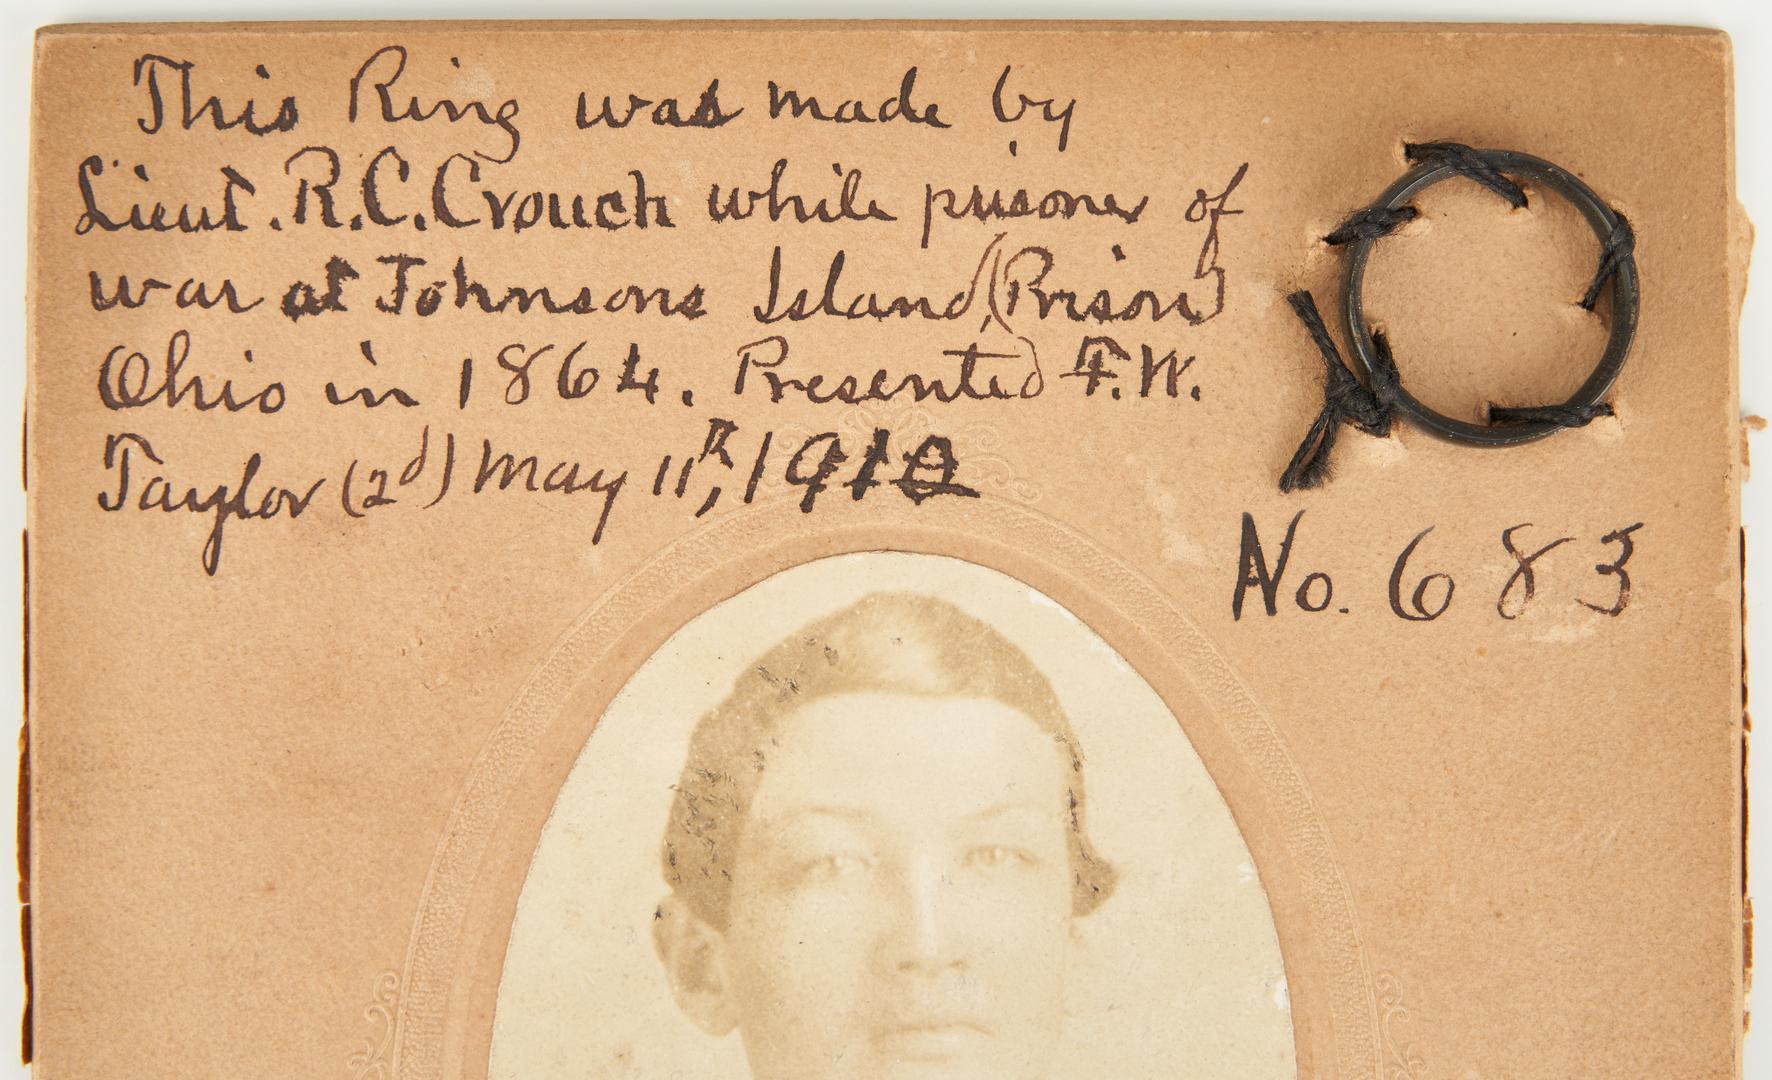 Lot 721: Civil War R.C. Crouch, Johnson's Island Photograph